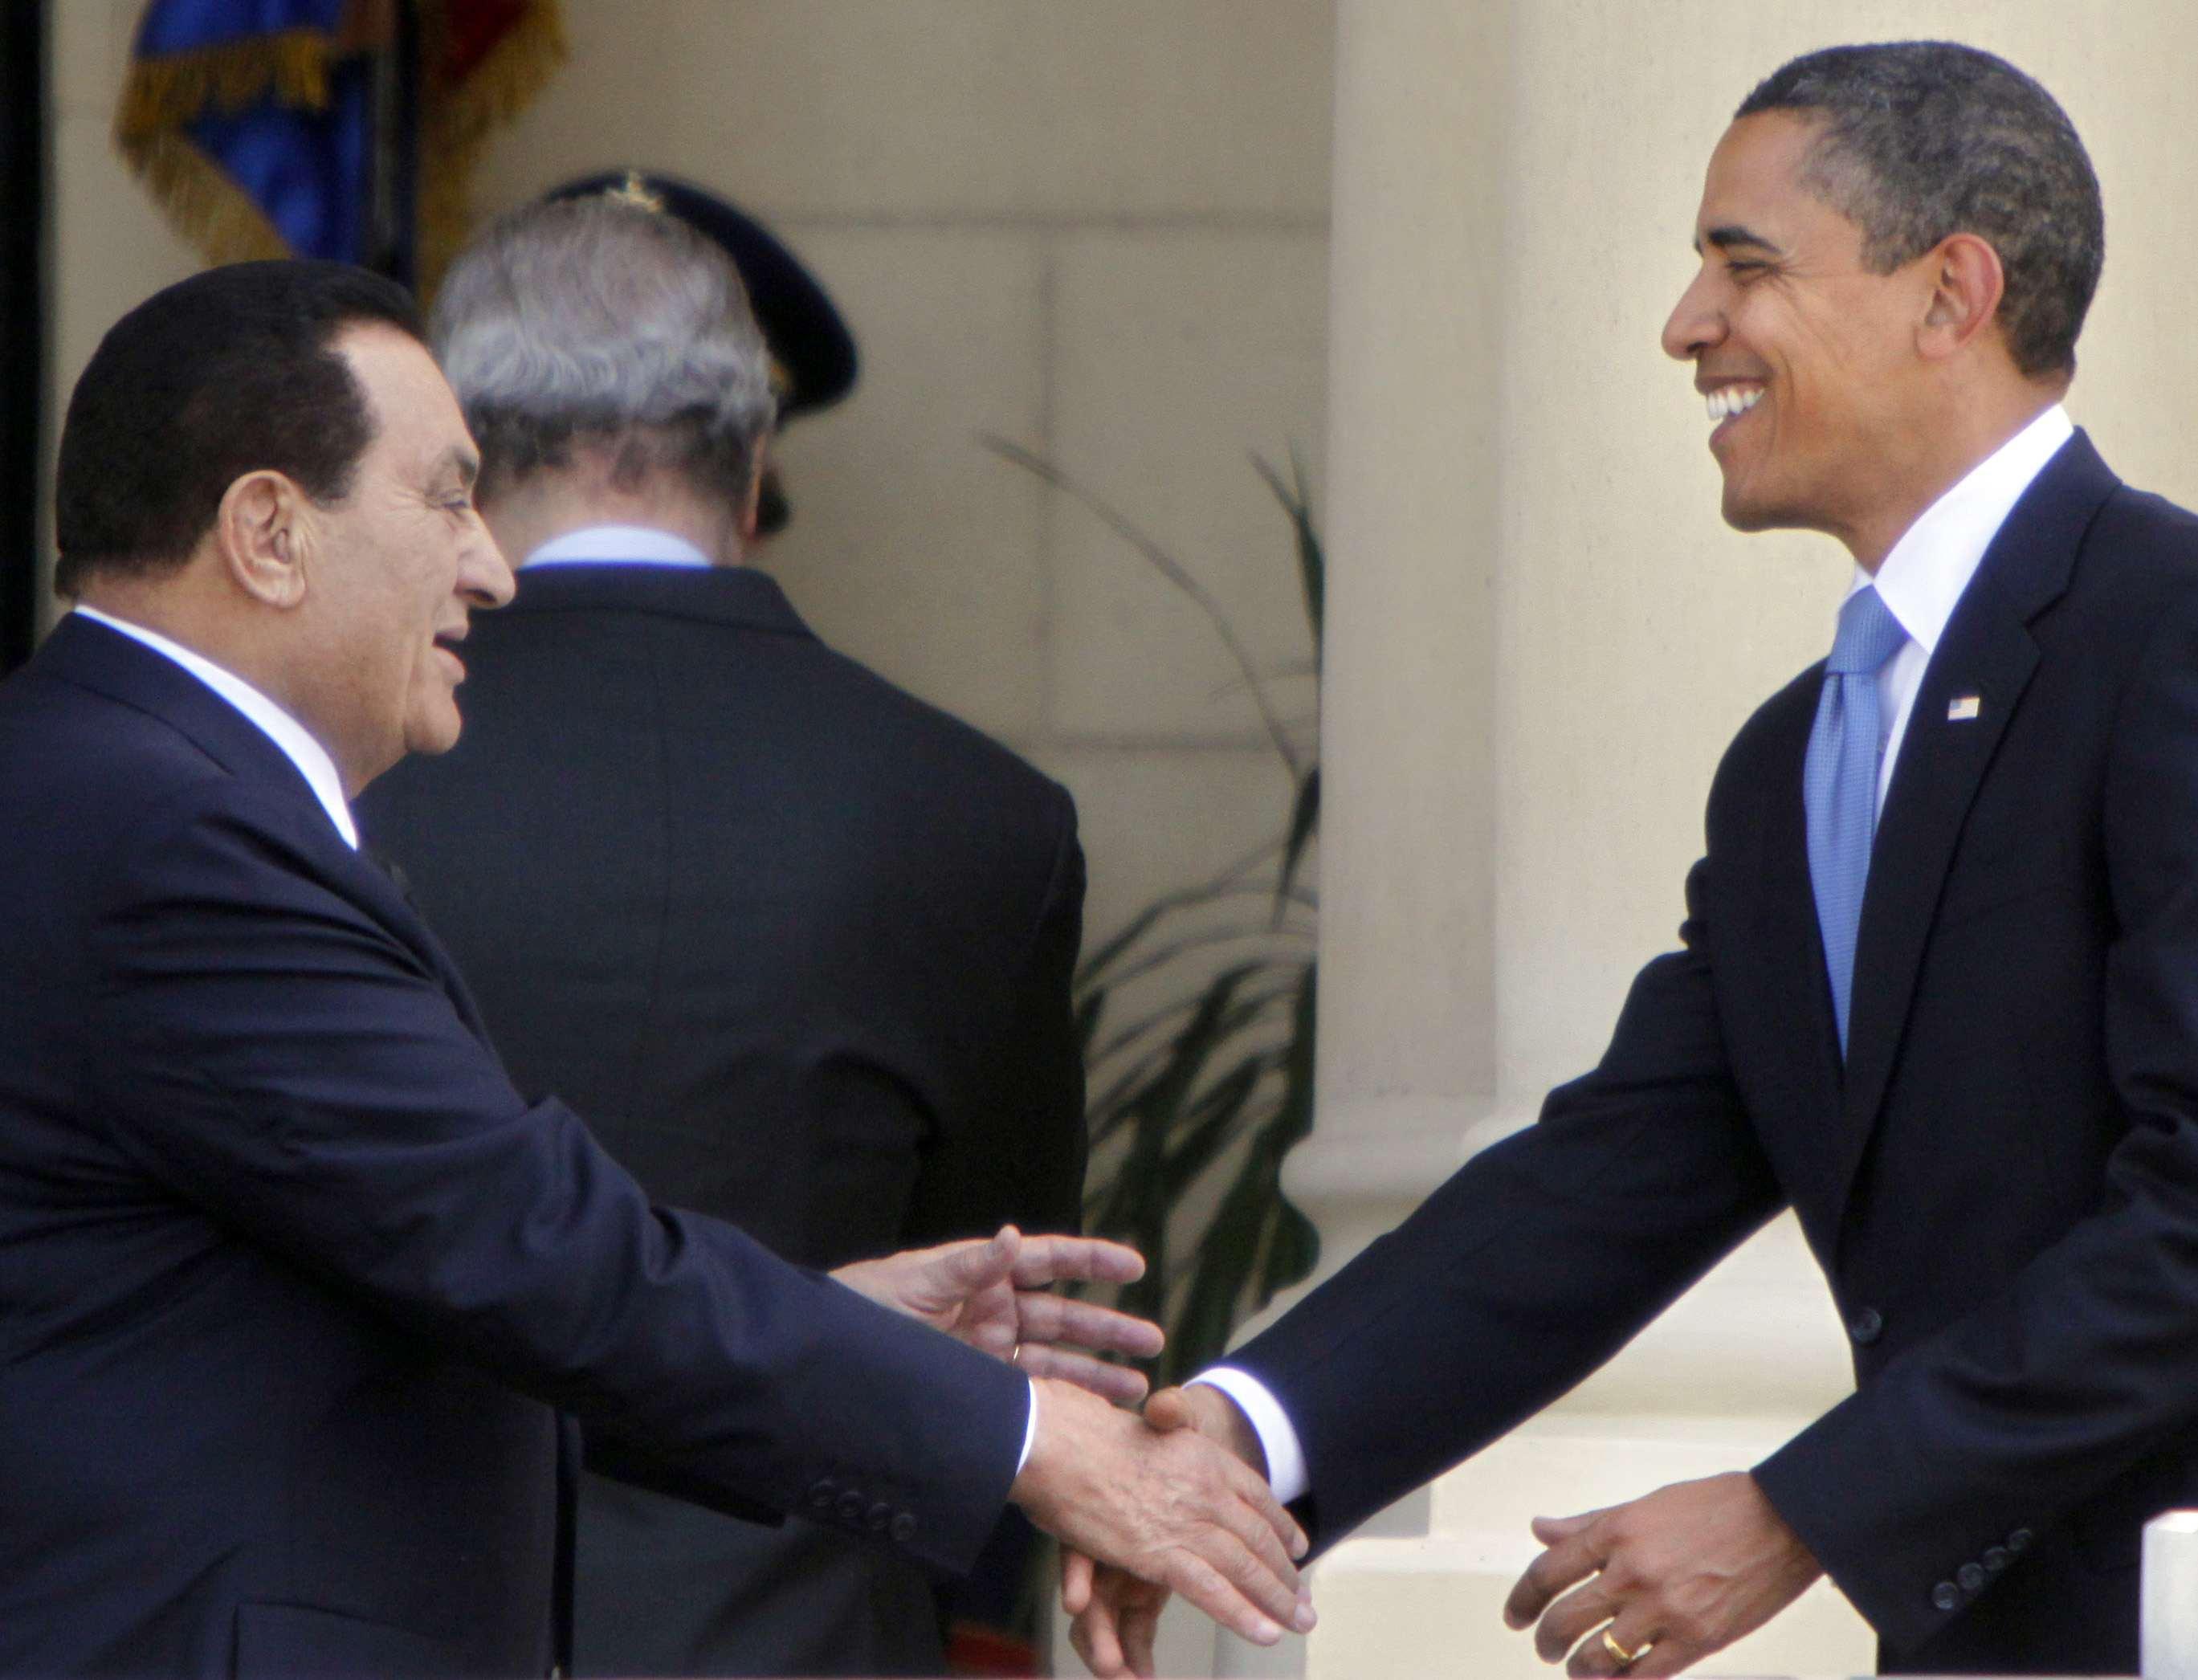 BETHANY BLANKLEY: Common Core ties to Libya, Qatar, Saudi